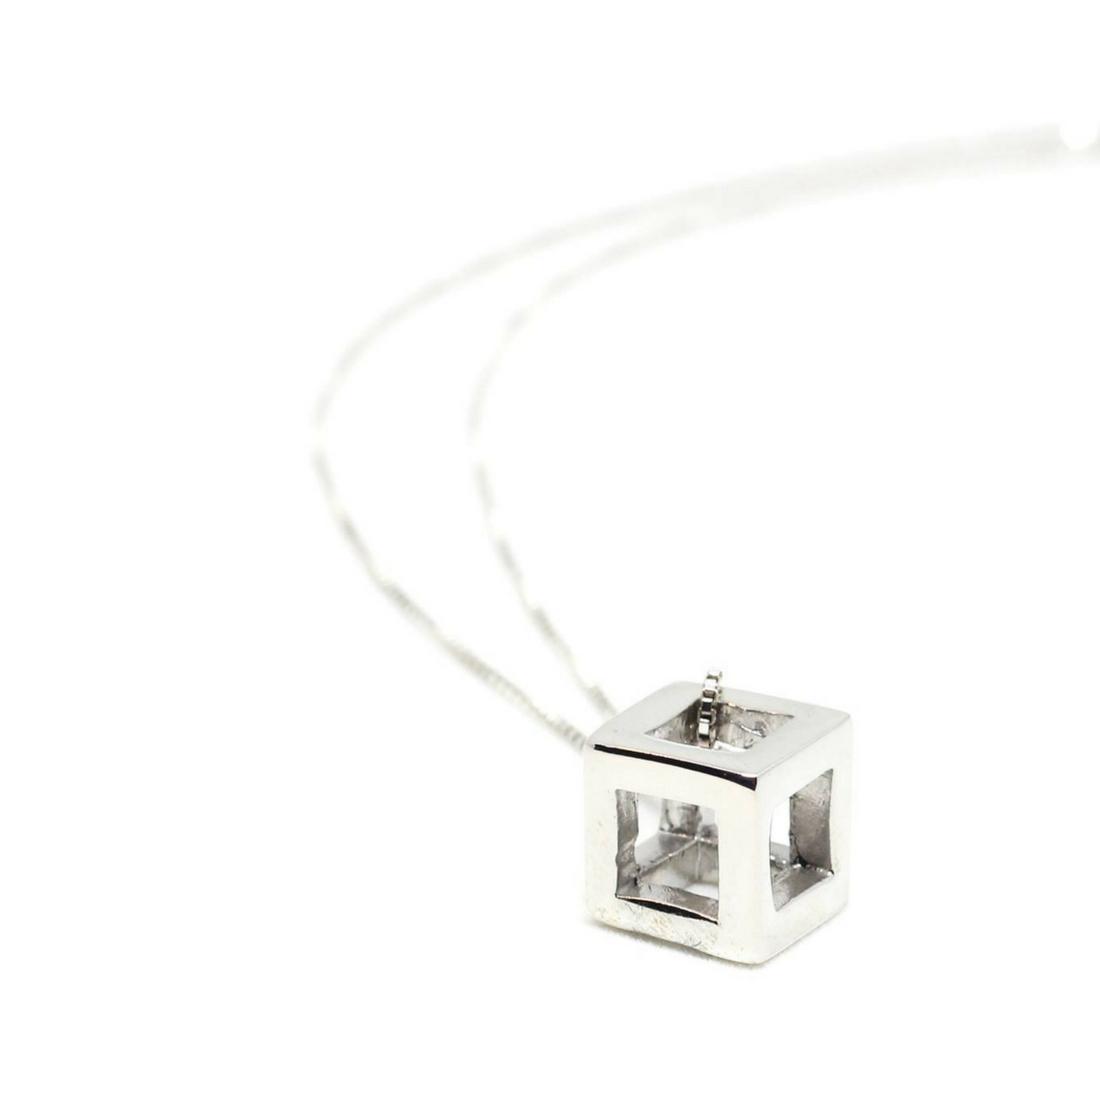 Q.Bo. Pendant Silver | Co.Ro. Jewels